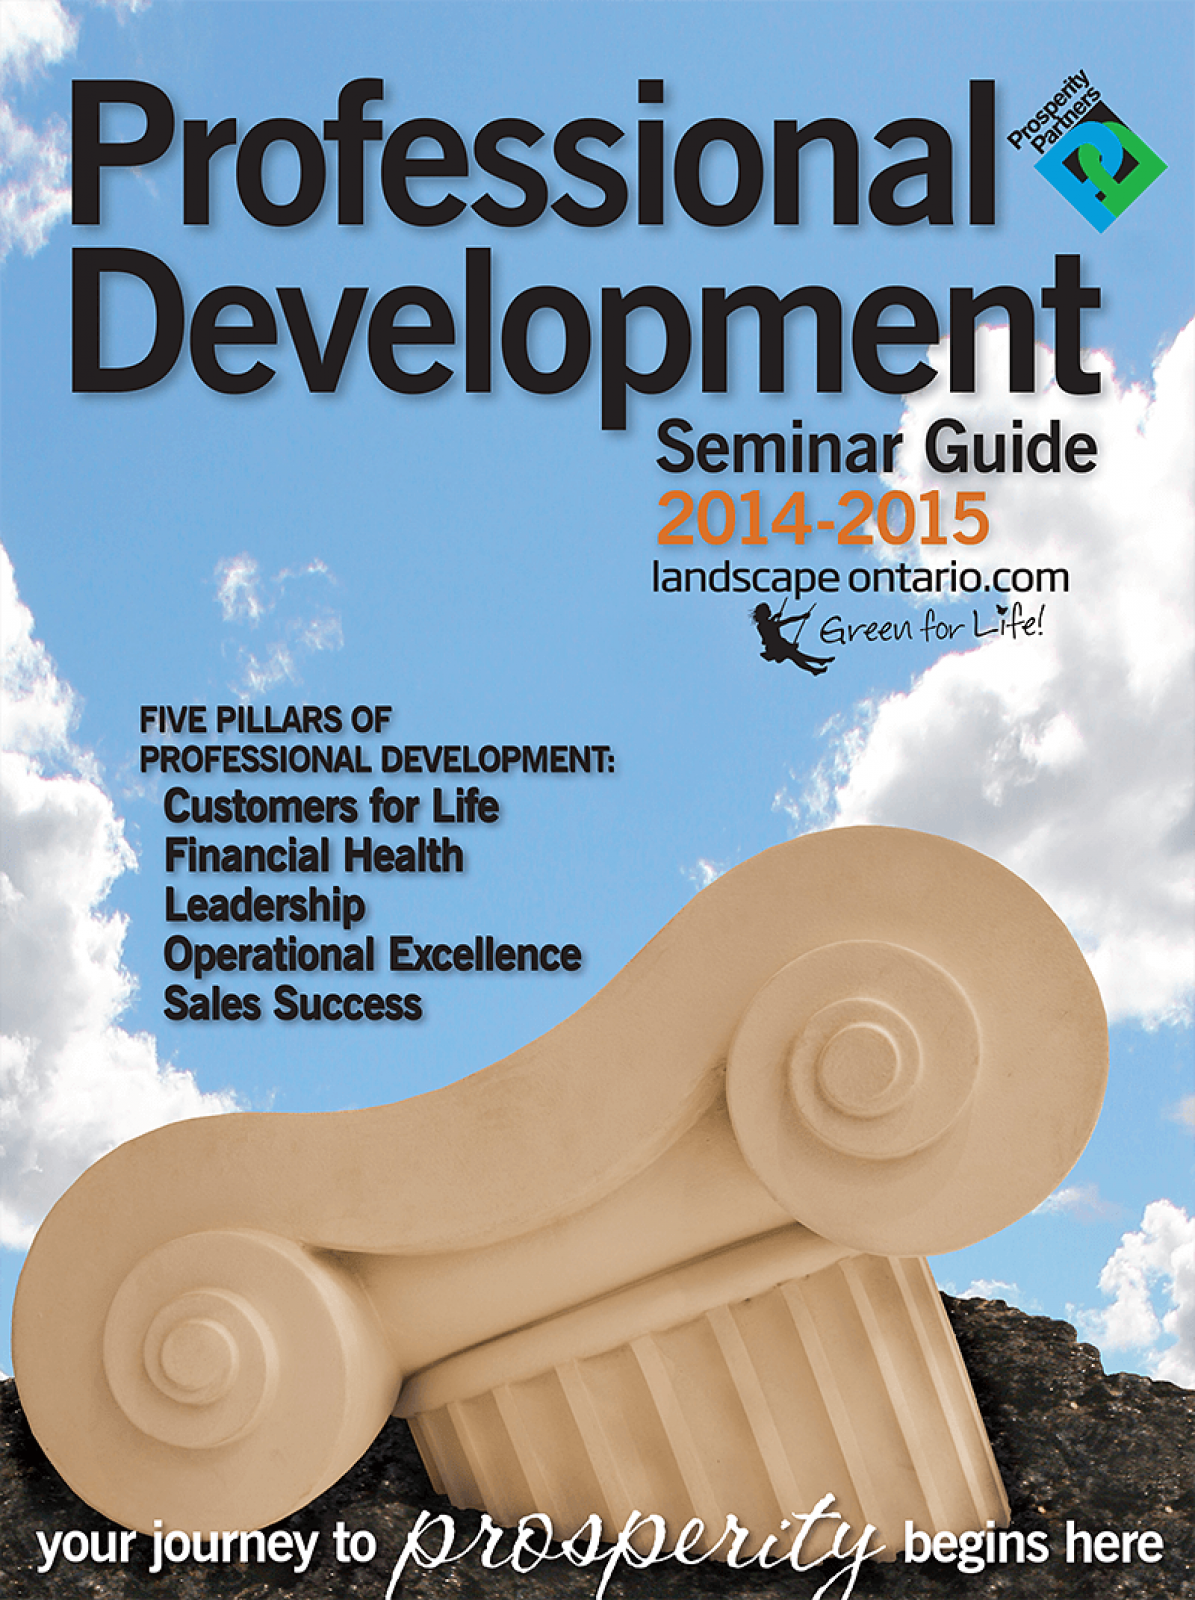 Professional Development Seminar Guide 2014-2015